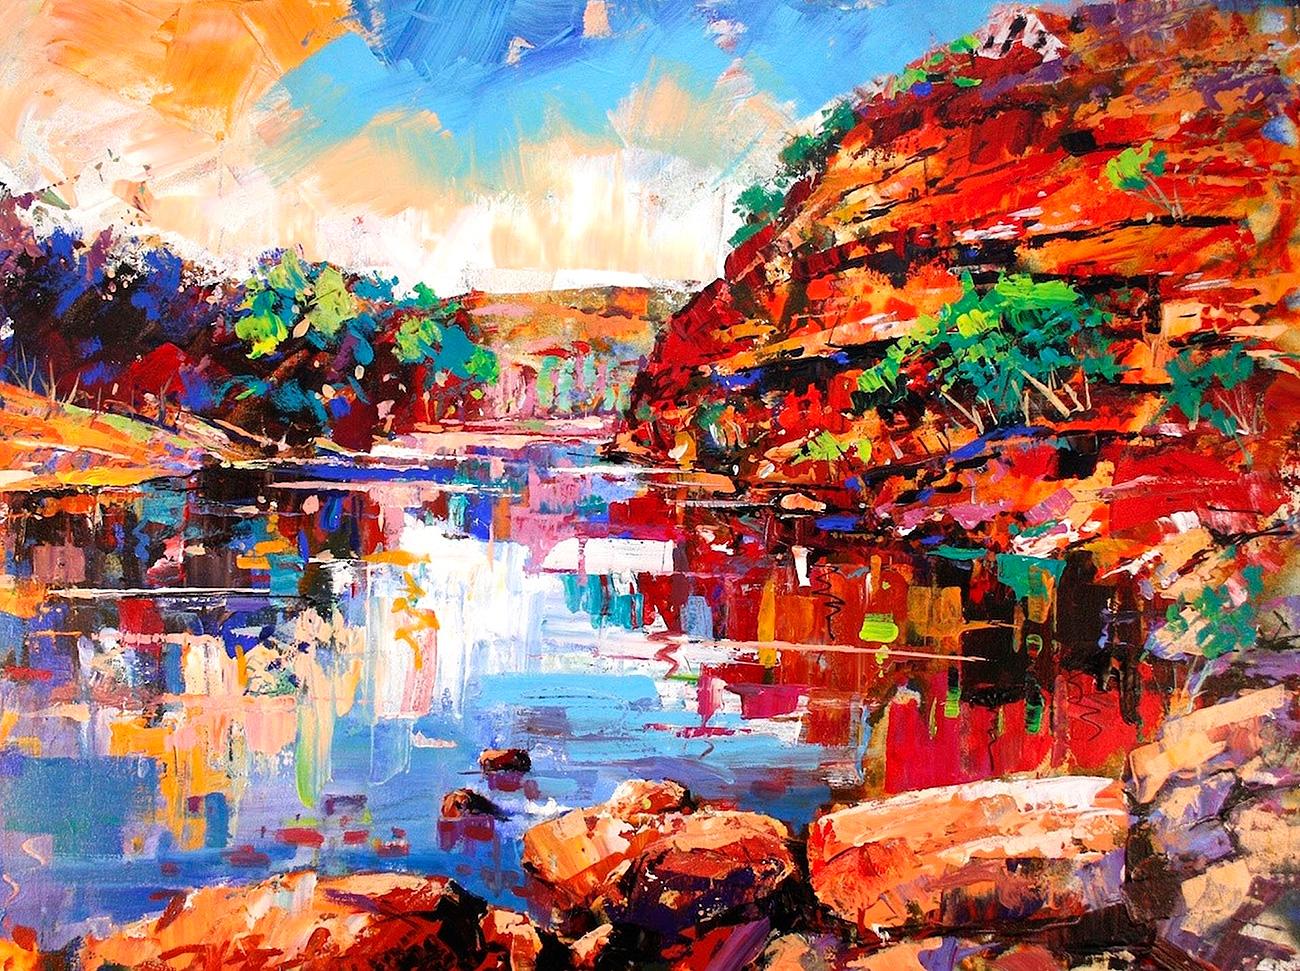 Jos Coufreur - 'Murchison River II, Kalbarri'